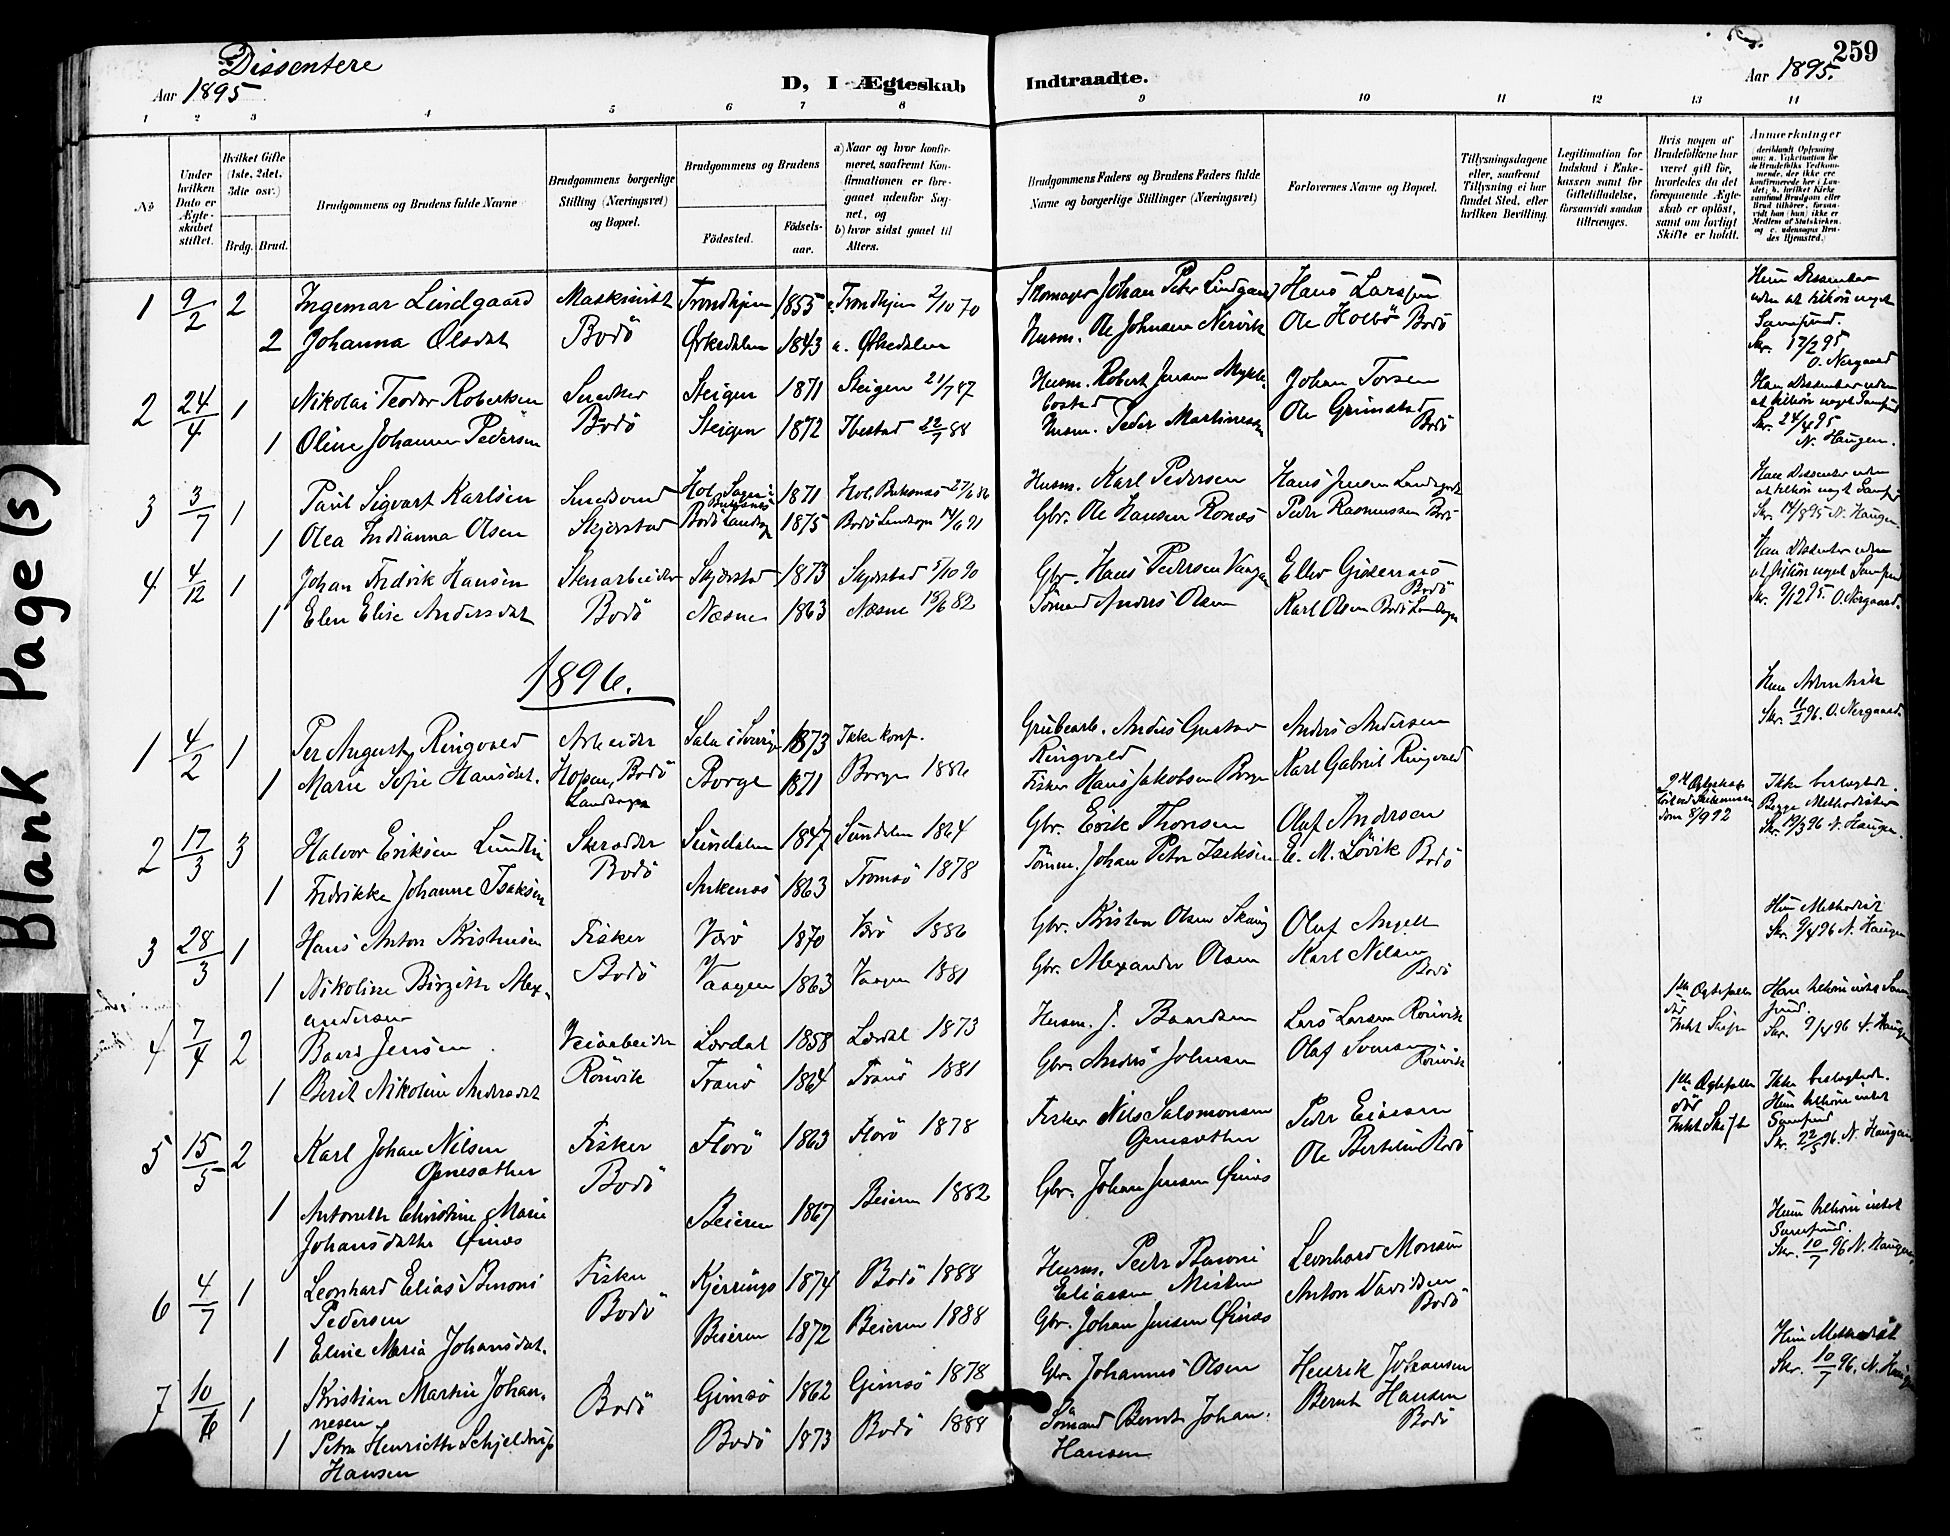 SAT, Ministerialprotokoller, klokkerbøker og fødselsregistre - Nordland, 801/L0010: Ministerialbok nr. 801A10, 1888-1899, s. 259